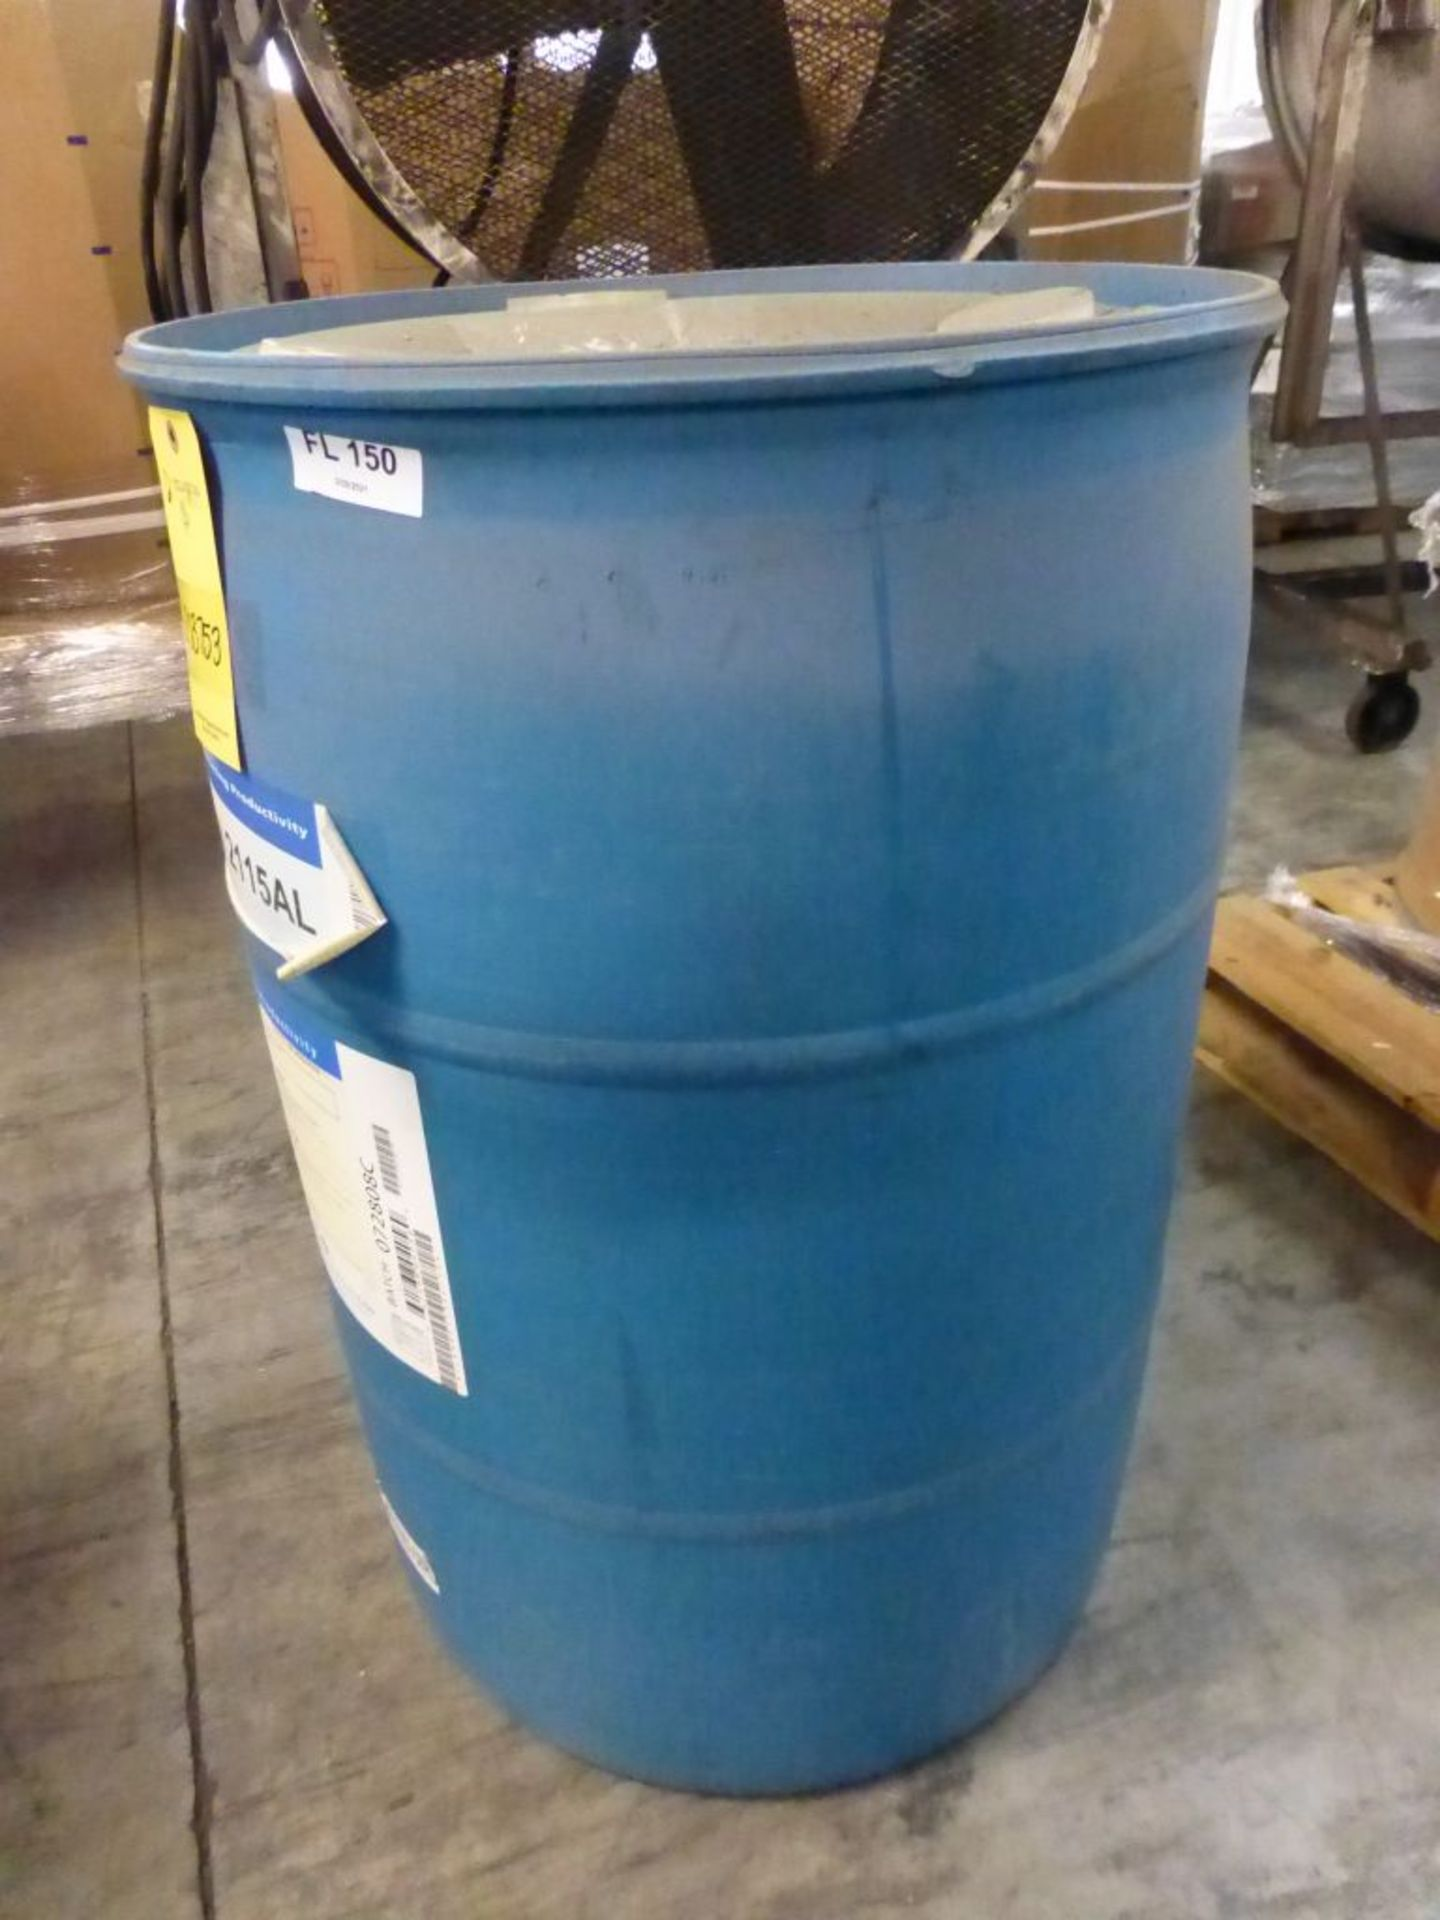 TRIM Clean 2115AL Low Foam Spray Washing Compound | Batch No. 072808C; 491 lbs - Image 5 of 5